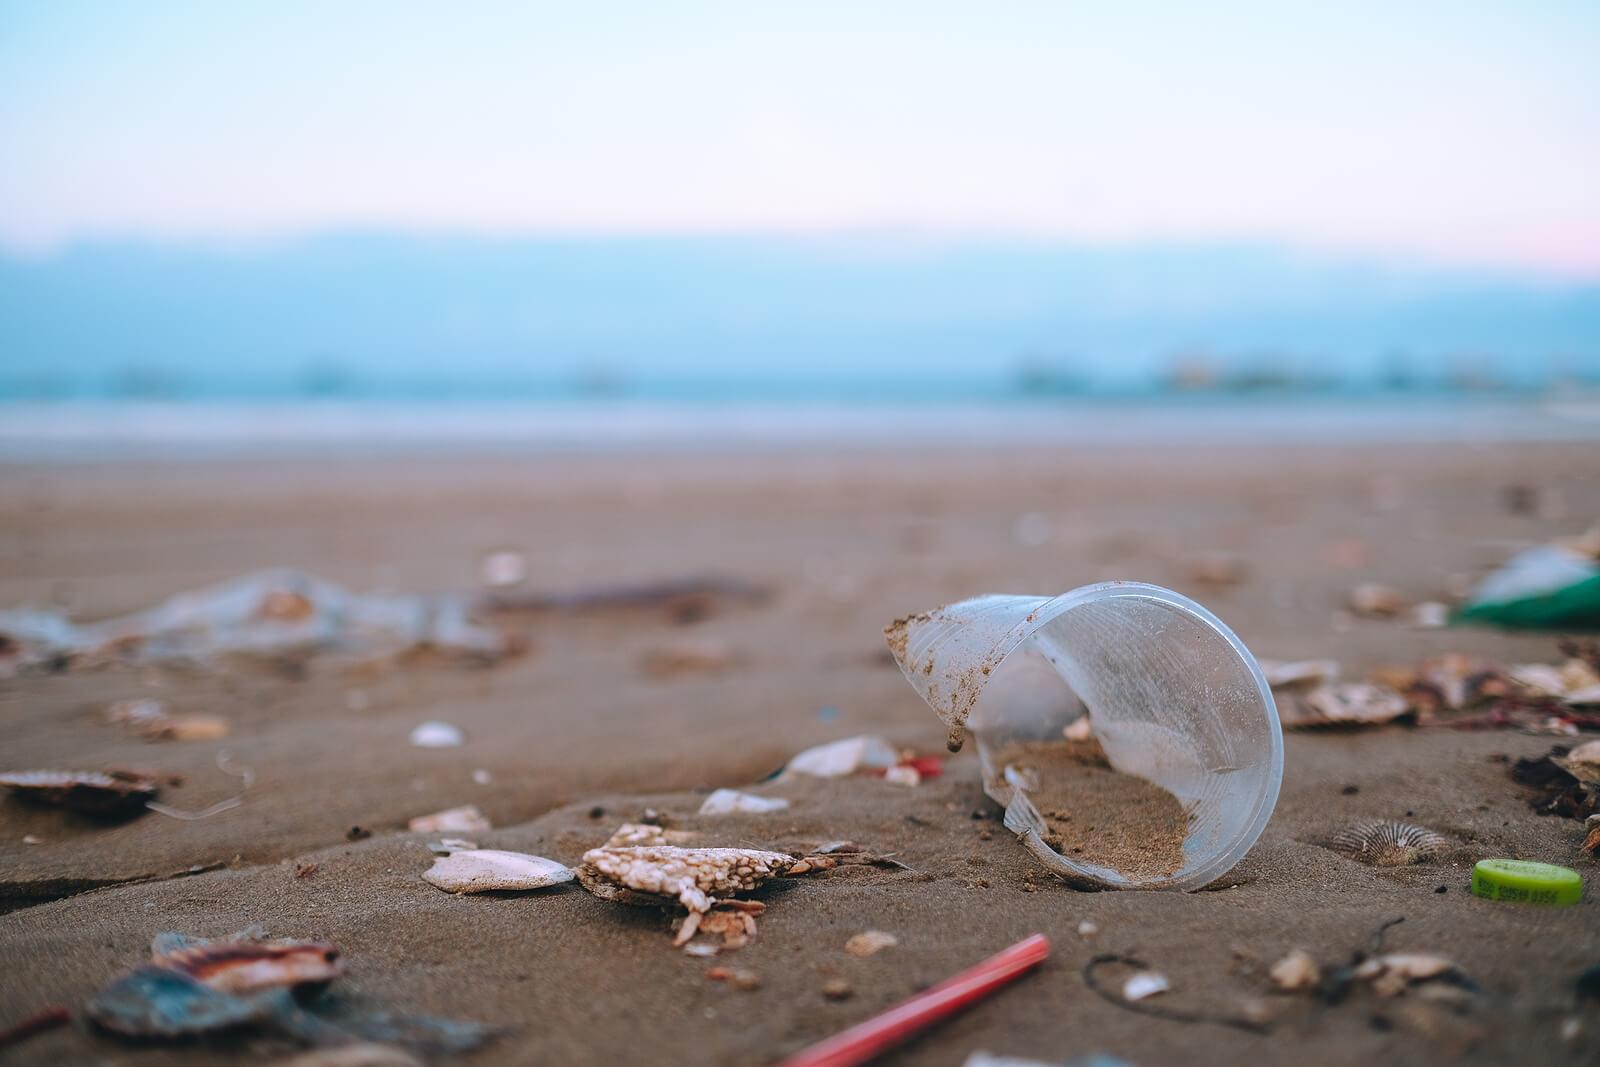 Plastic litter on a sandy beach